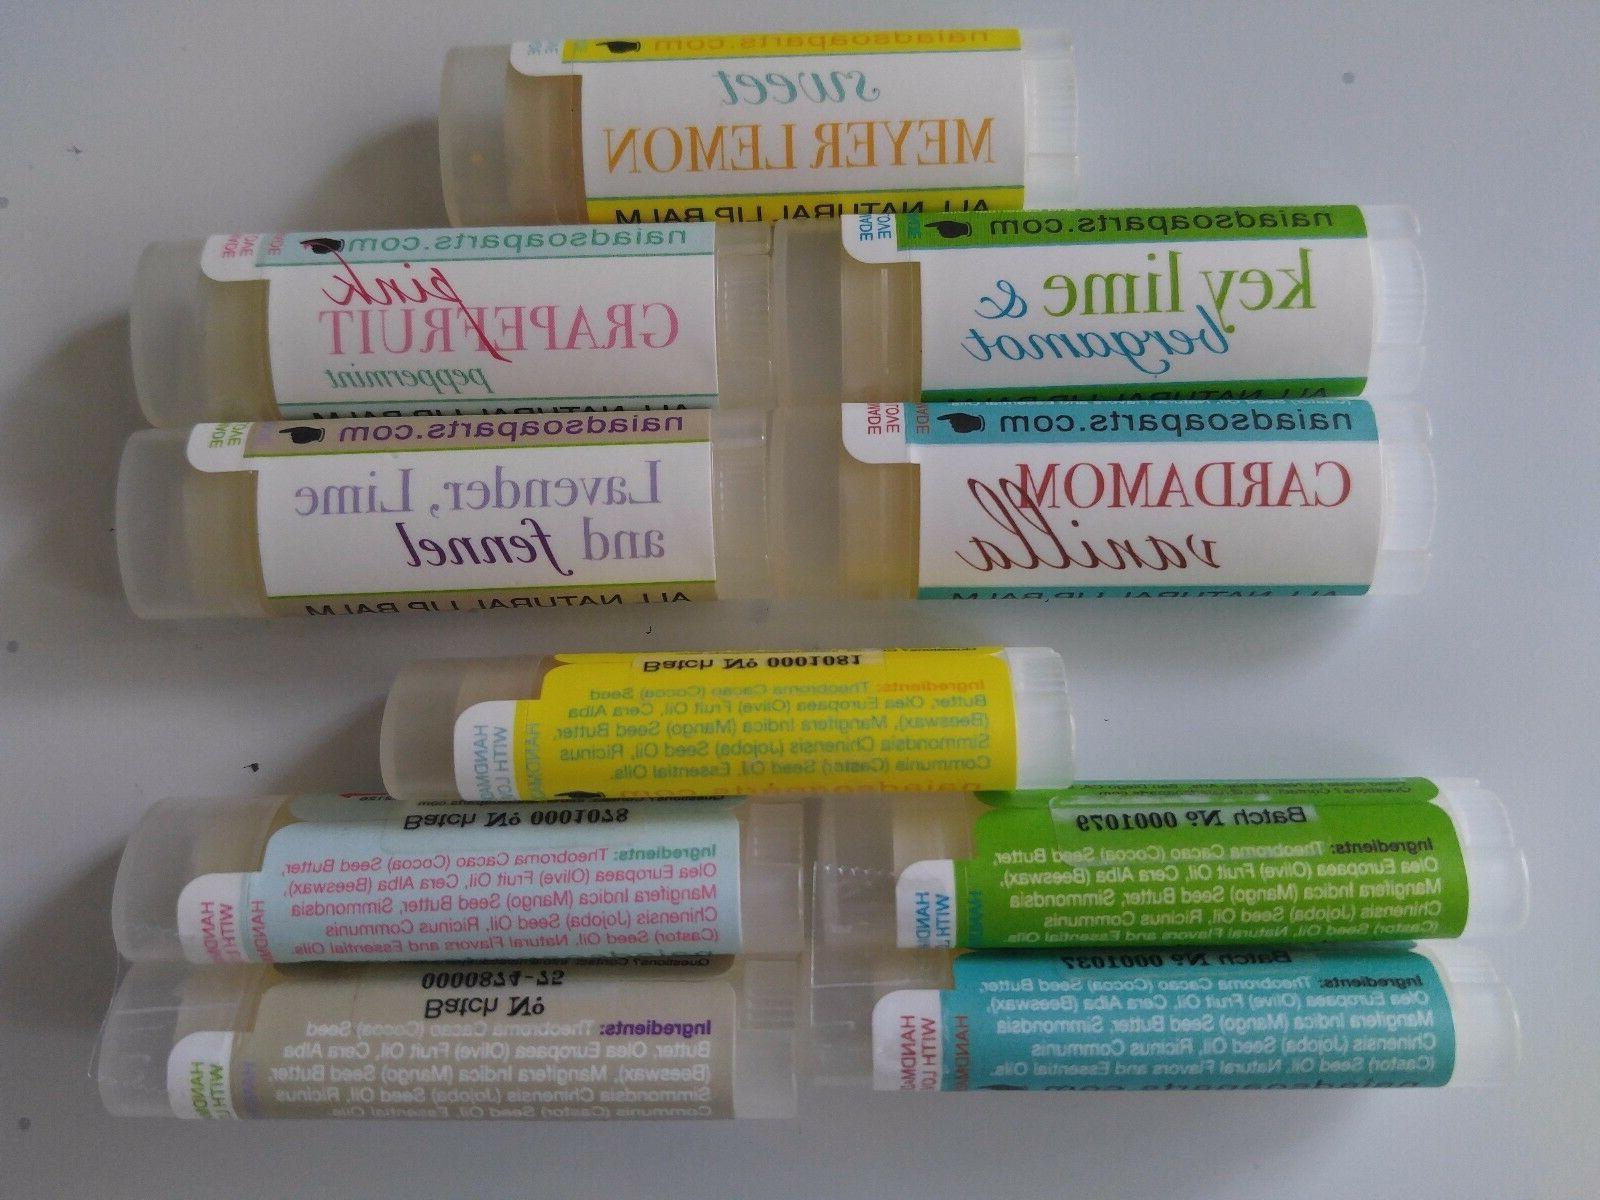 Naiad Homemade Flavored Lip Balm Conditioners  - .15oz